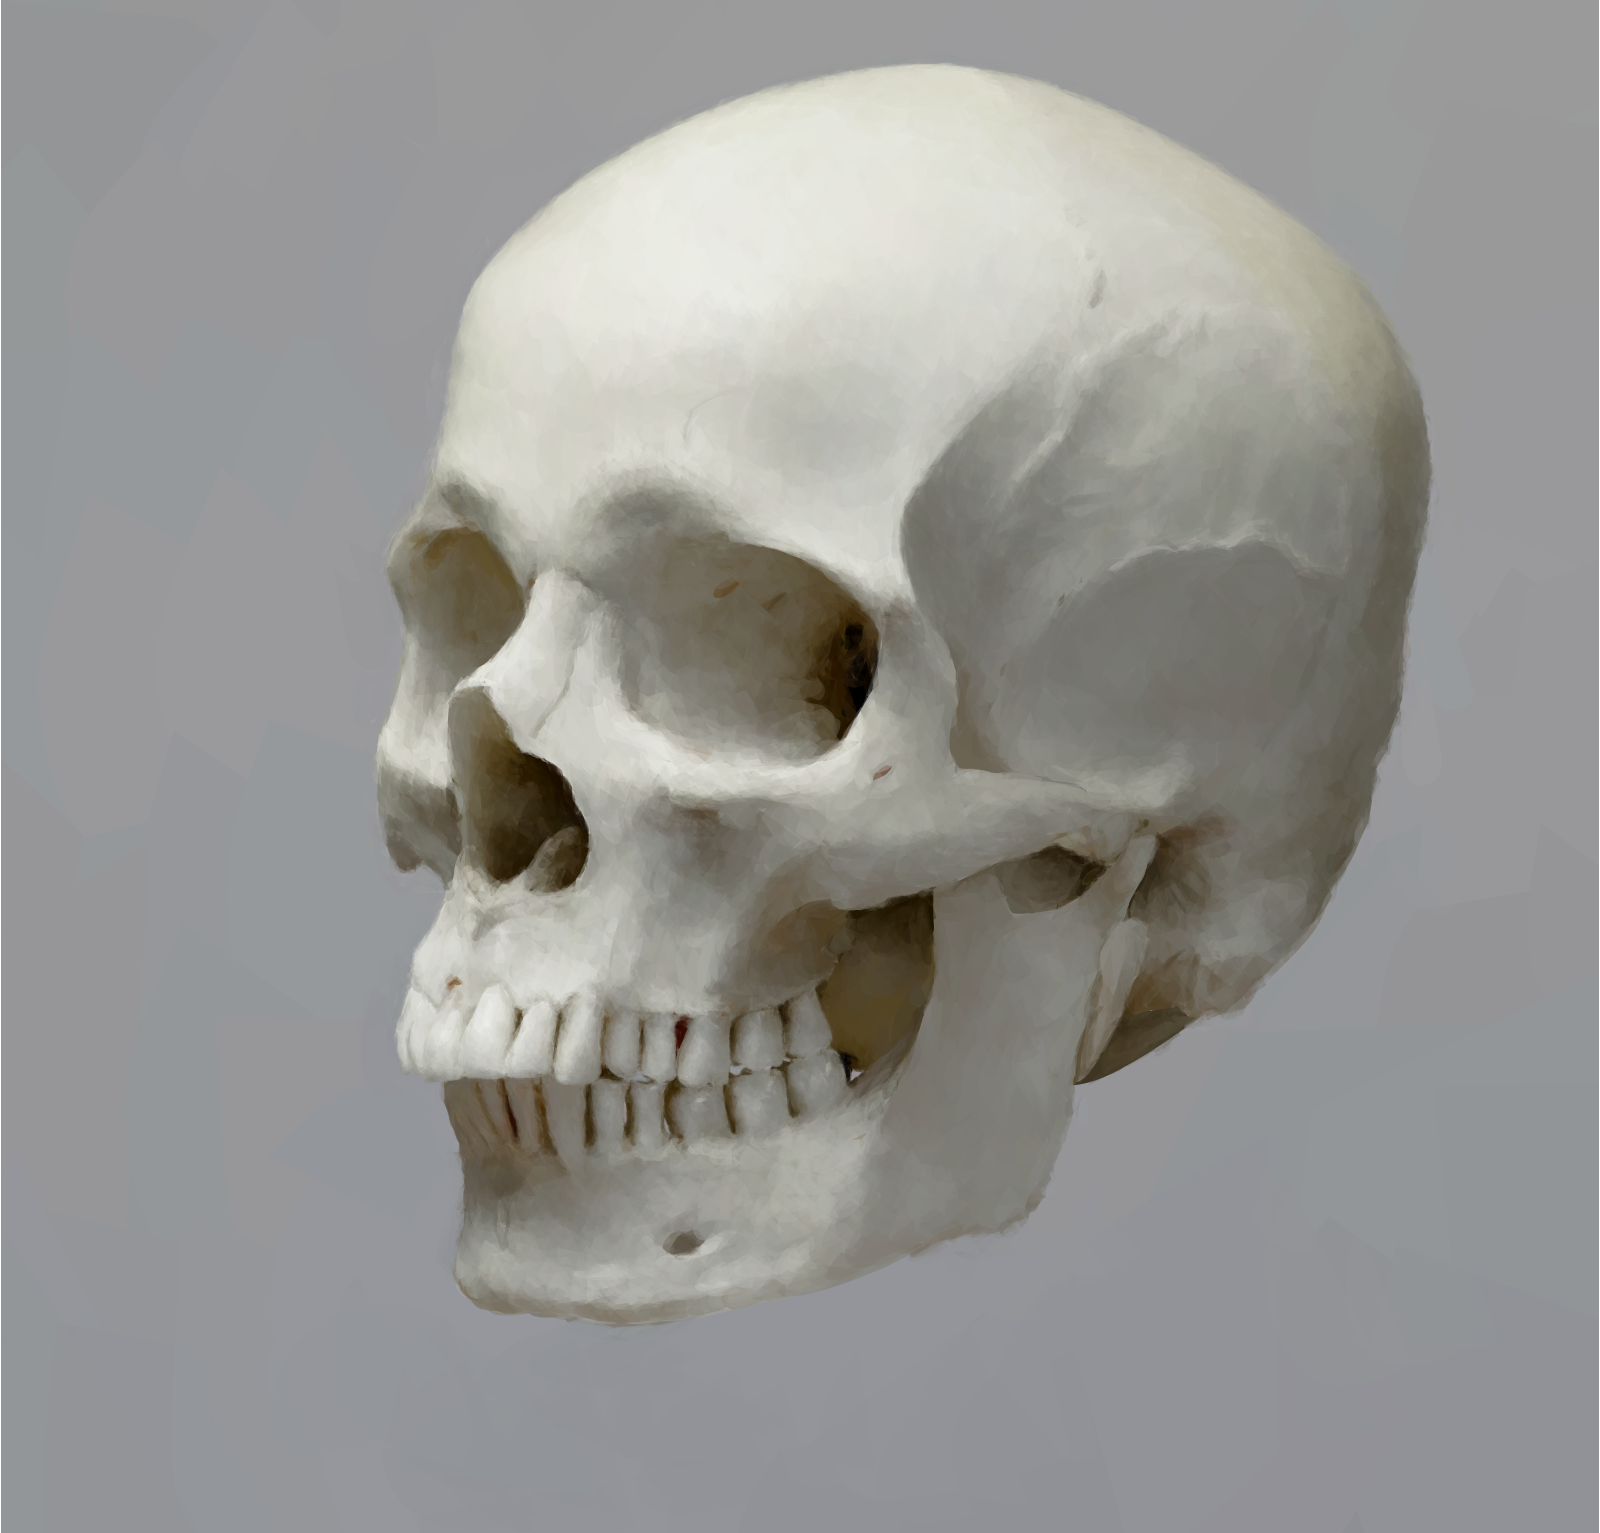 skull 16 drawings sketchport